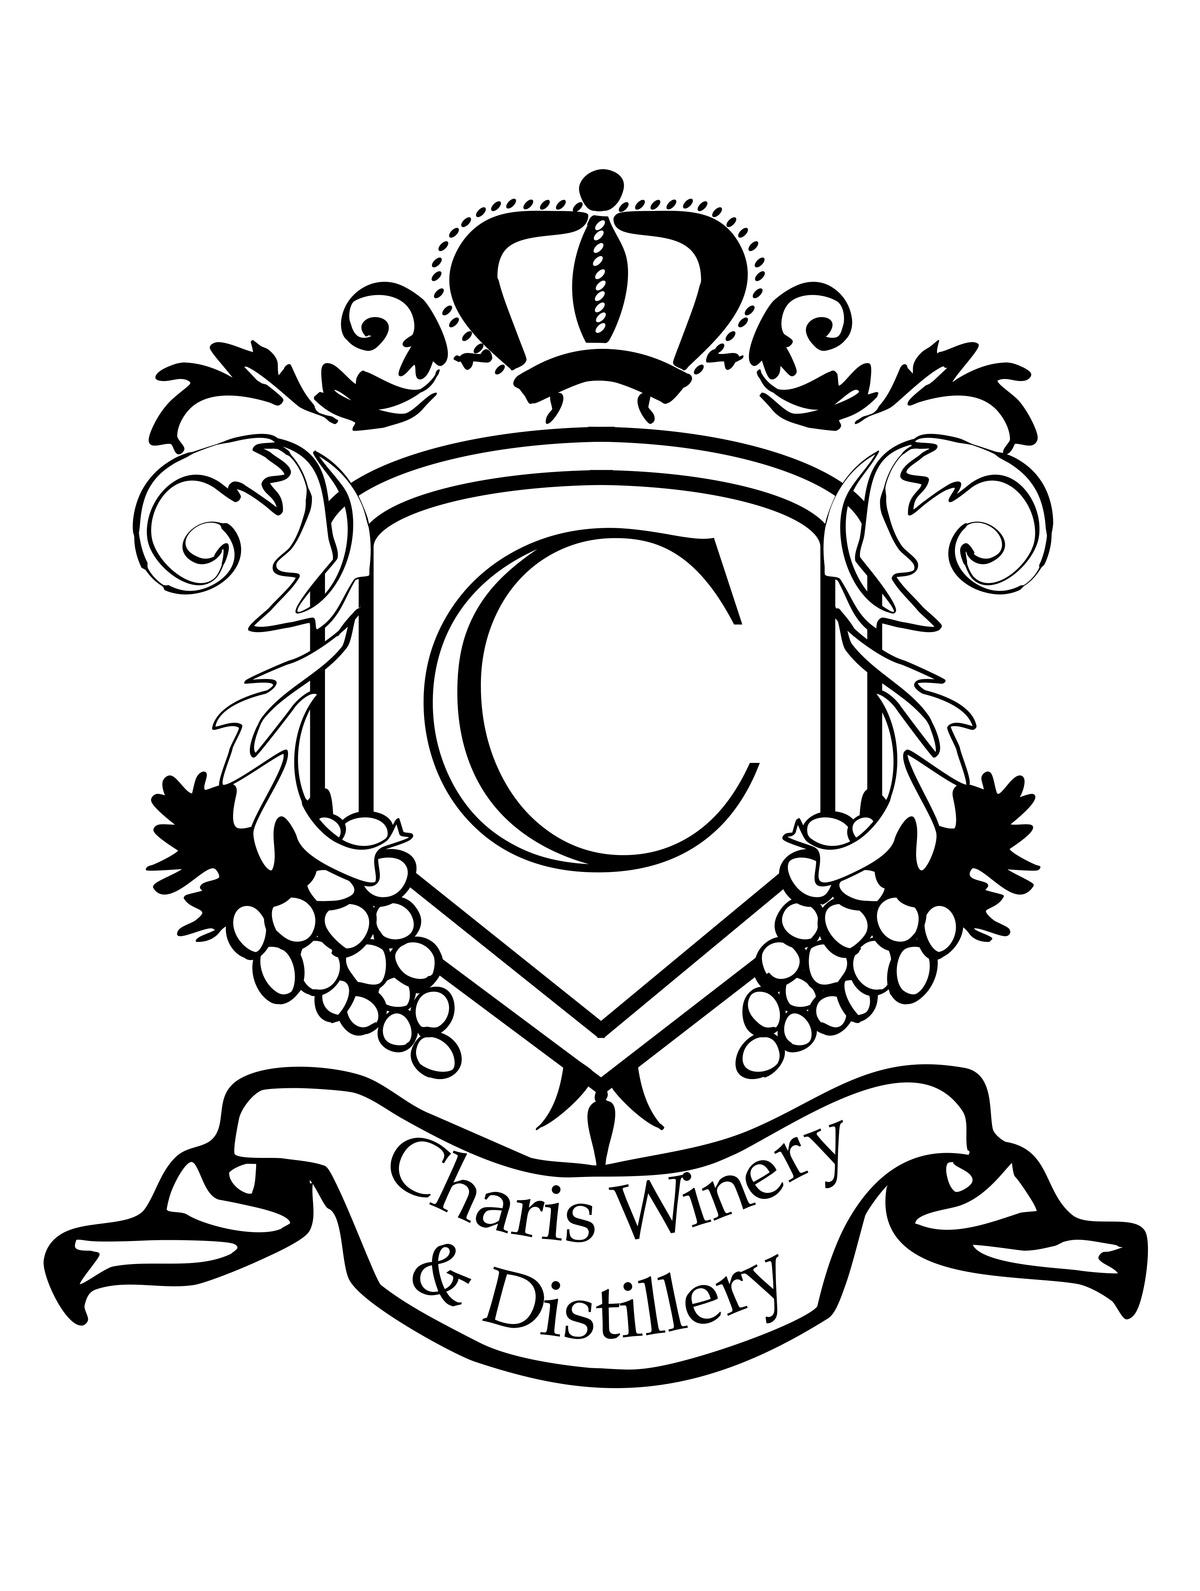 charis_logo